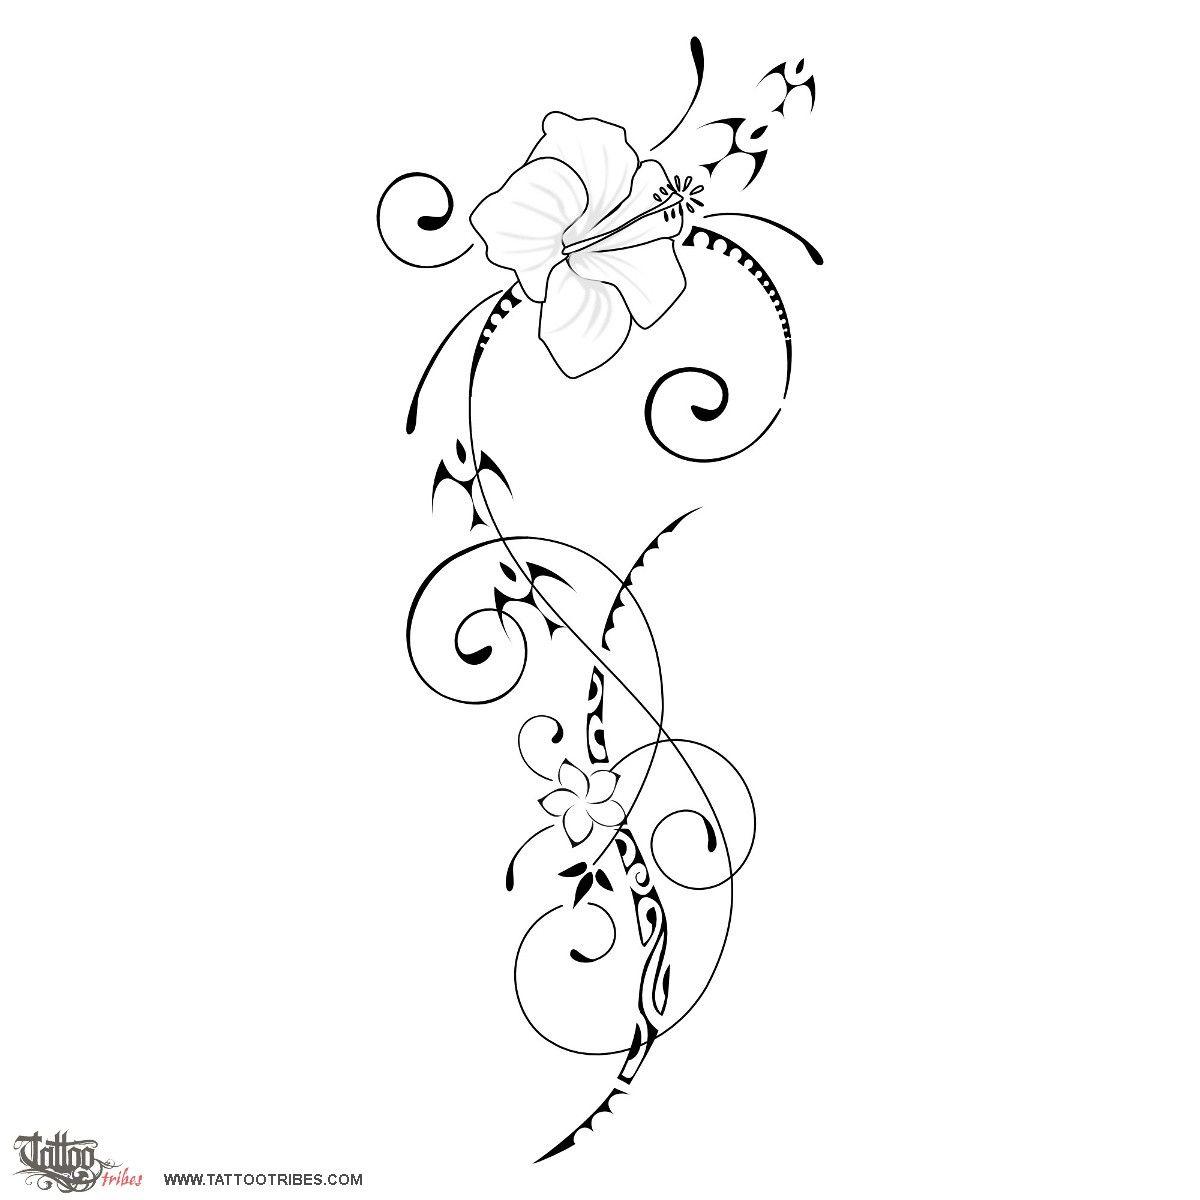 Ātaahua Hibiscus Flowers Represent Beauty, Femininity And